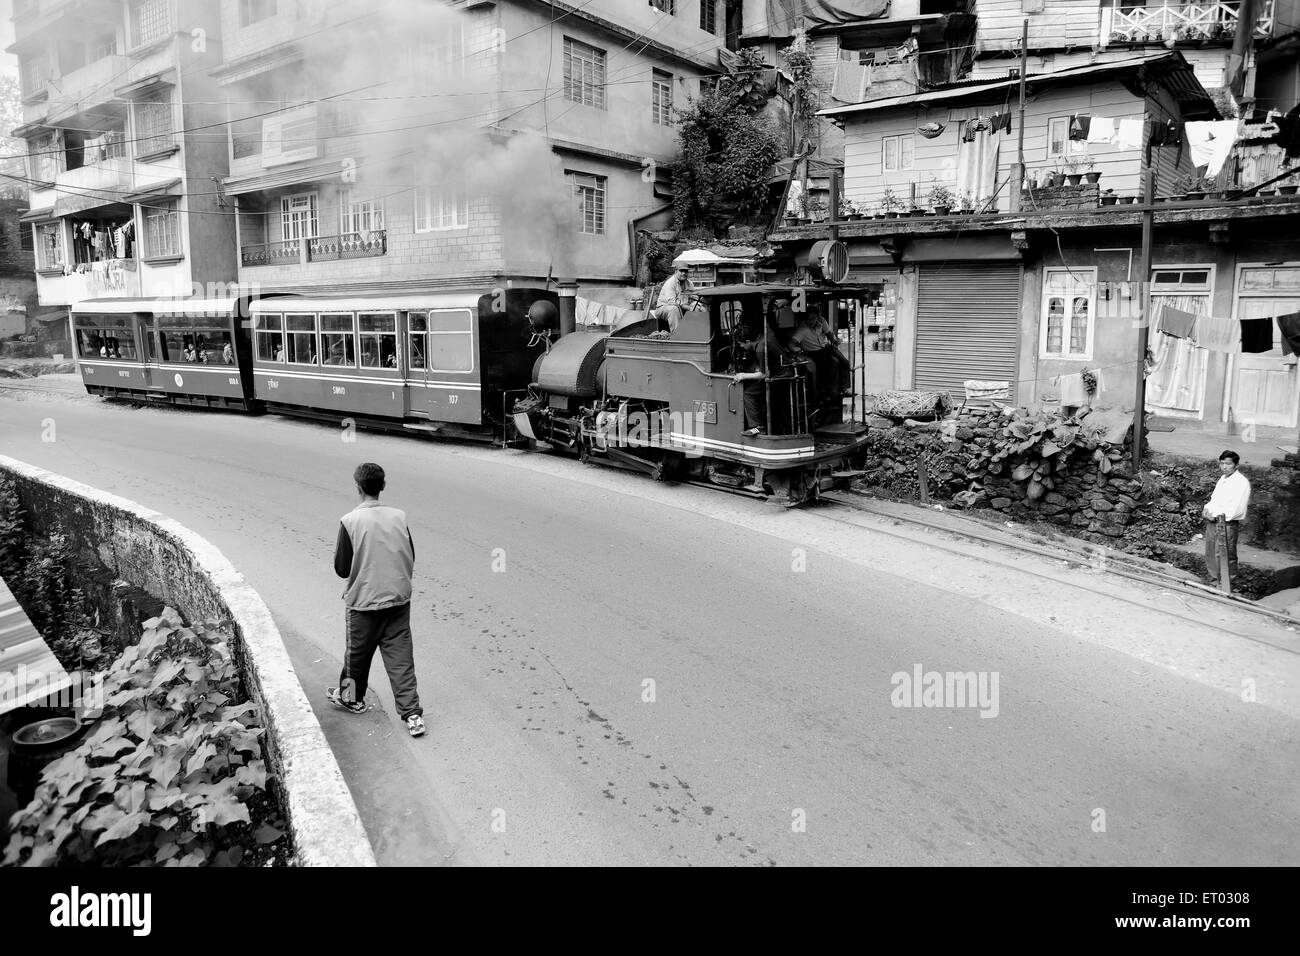 Toy train of Darjeeling Himalayan railway , West Bengal India , 2011 - Stock Image